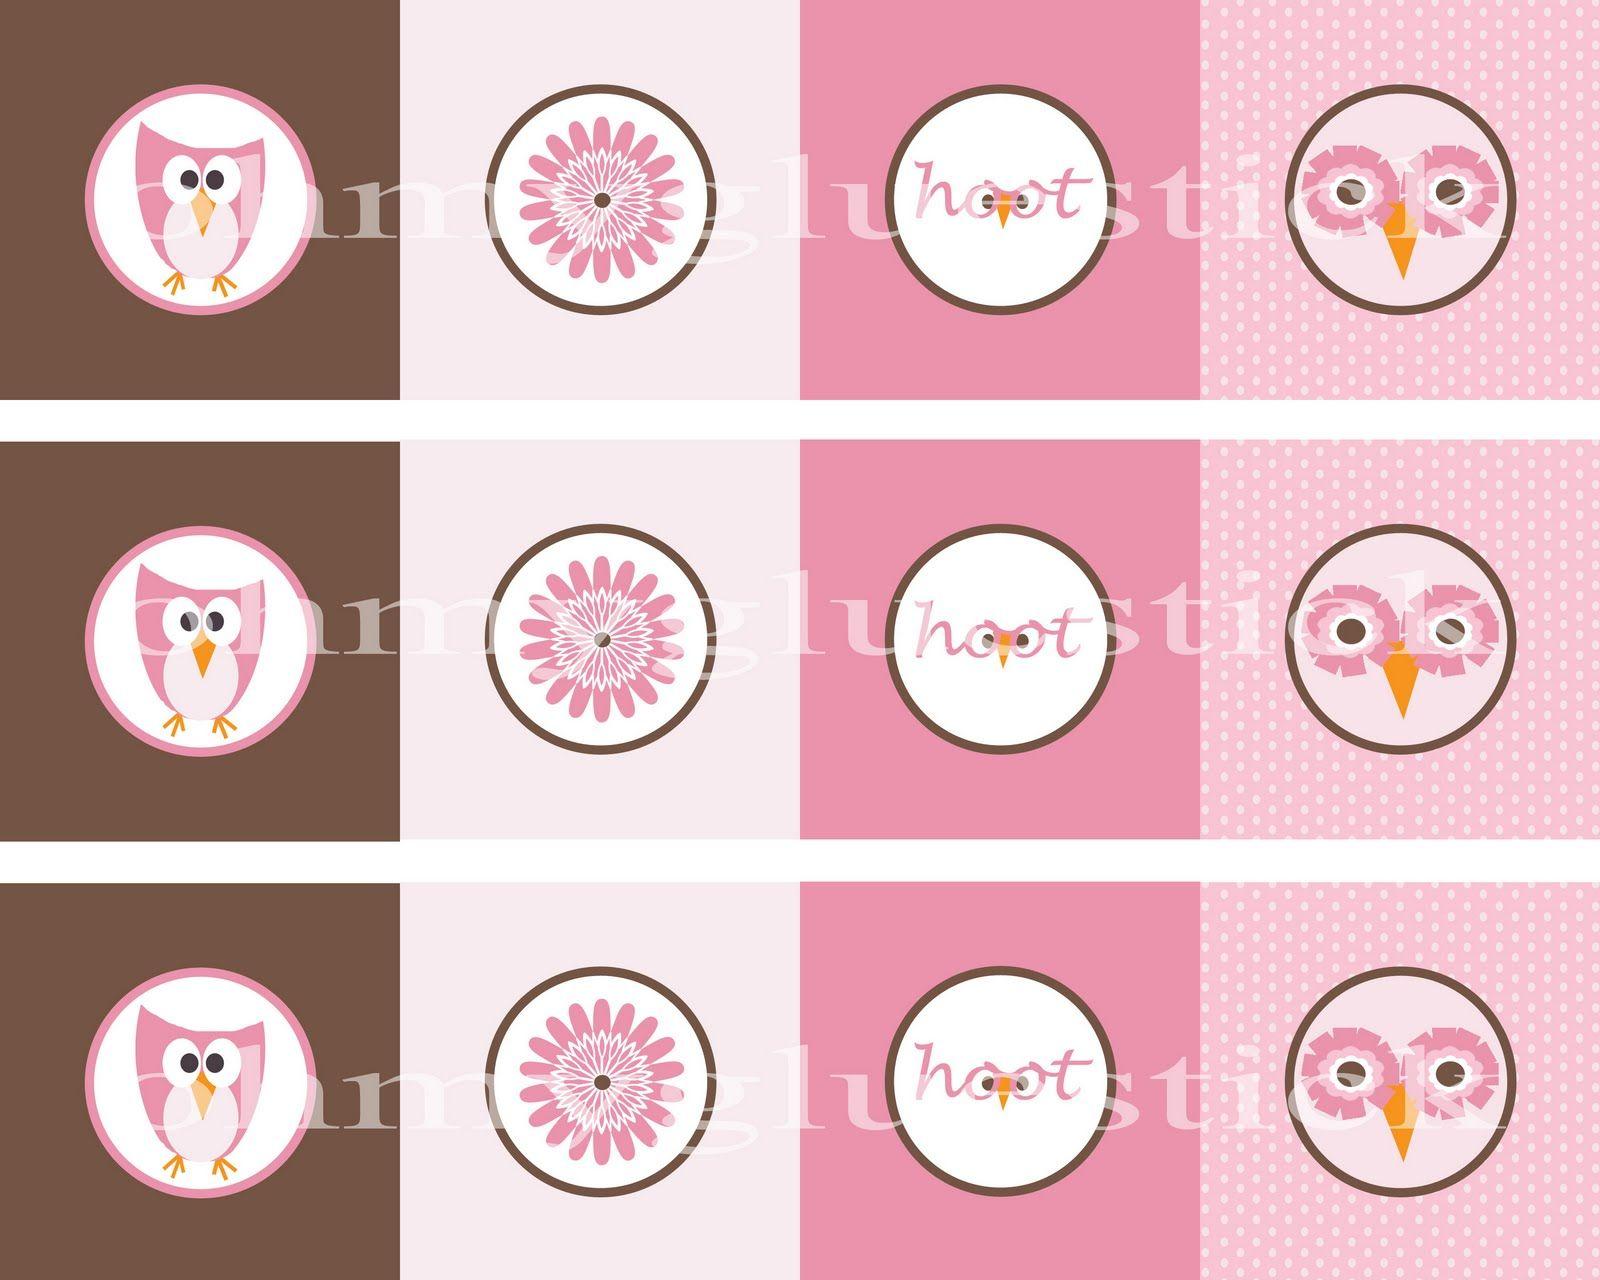 [pink+owl+theme+party+pack+watermark.jpg]